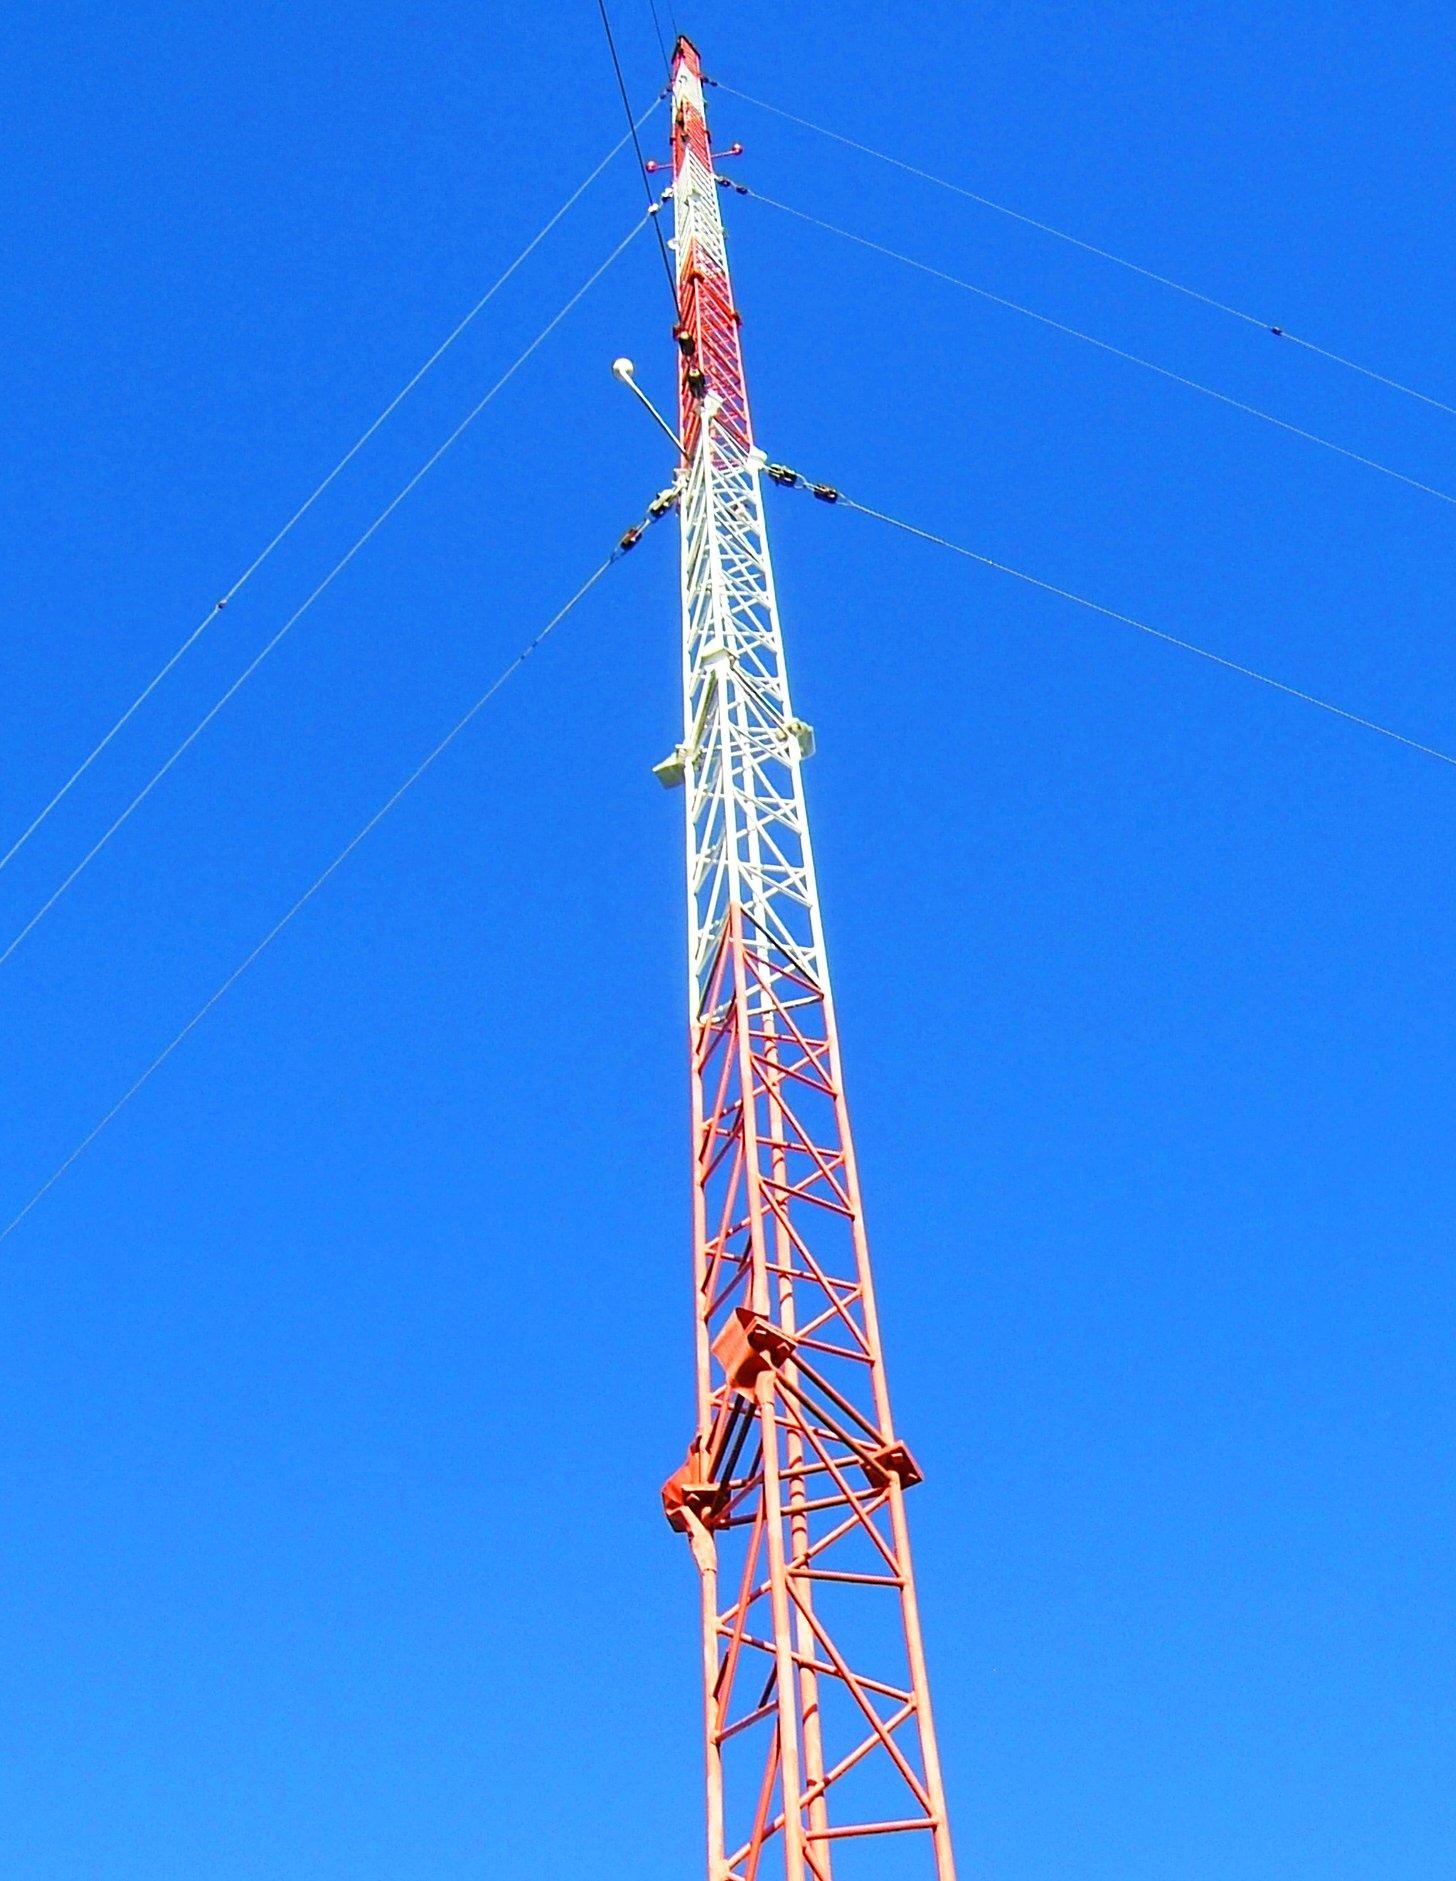 FileKBRC AM radio antenna tower.JPG   Wikimedia Commons